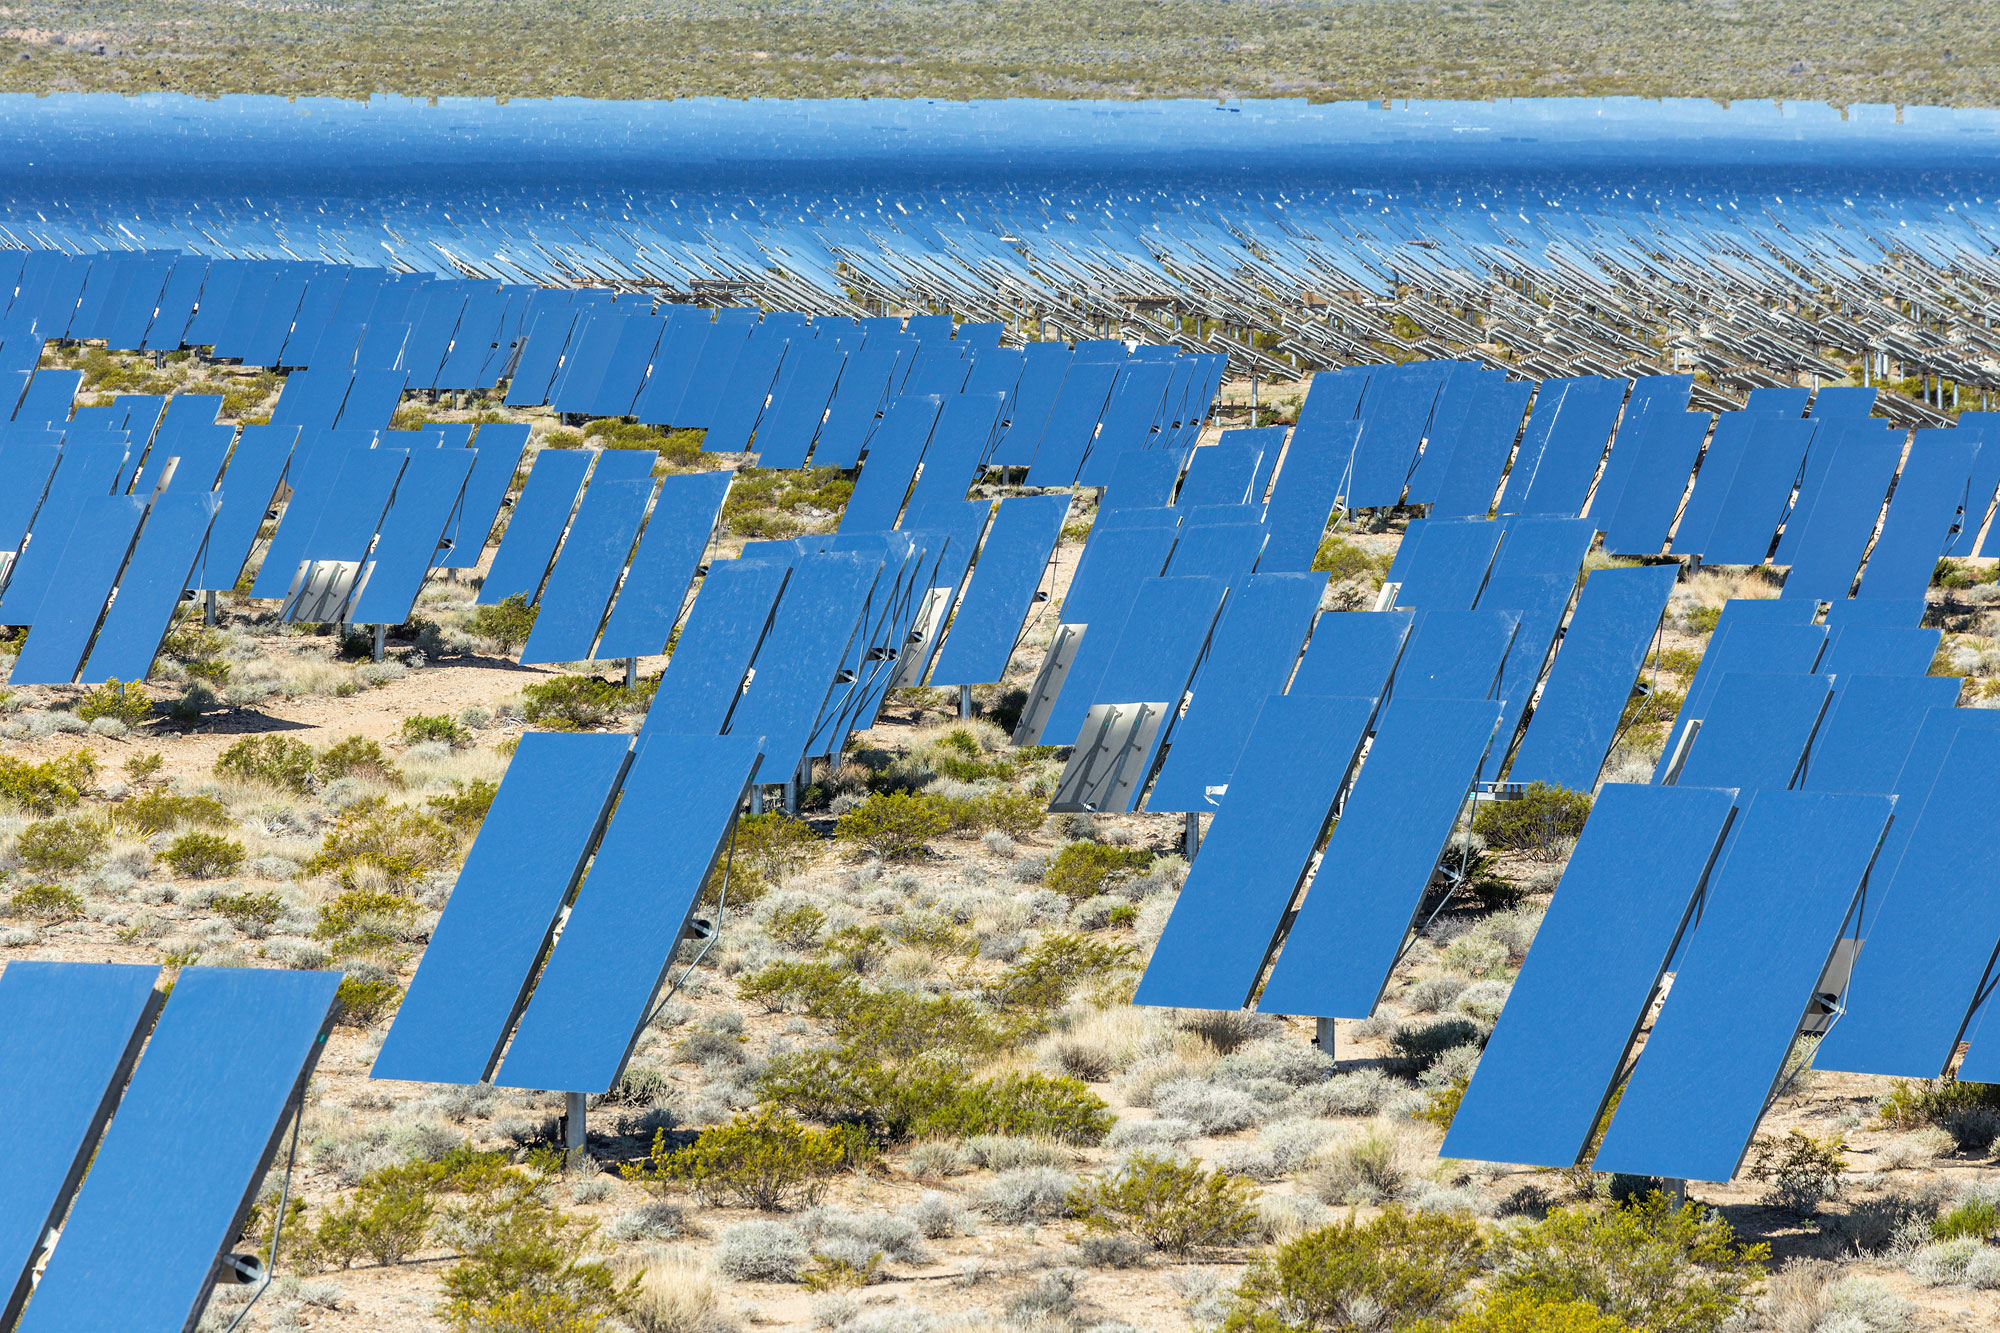 Ivanpah Thermal Solar Plant, CA. Study #17 (35,34.1675N 115,28.0135W)